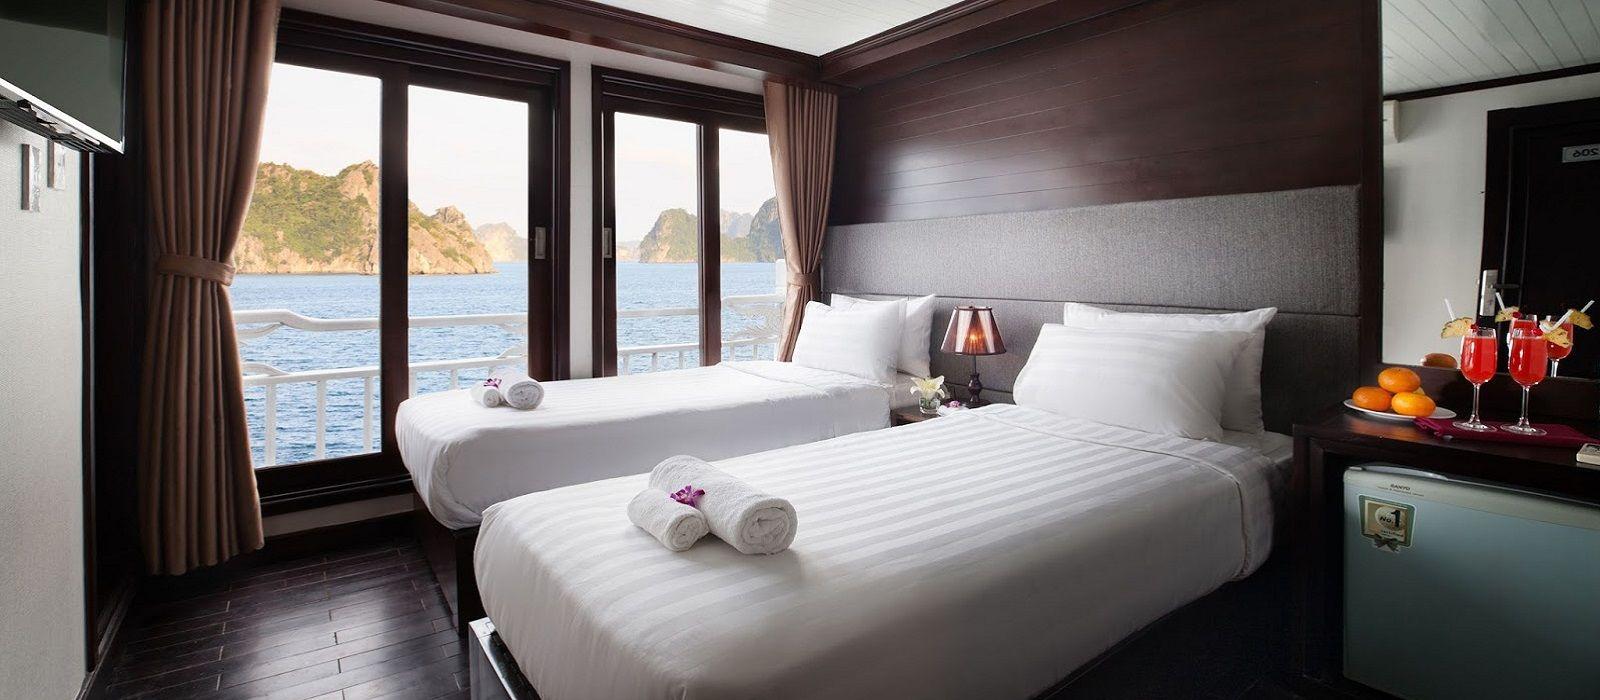 Hotel Stella Cruise Halong Bay Vietnam